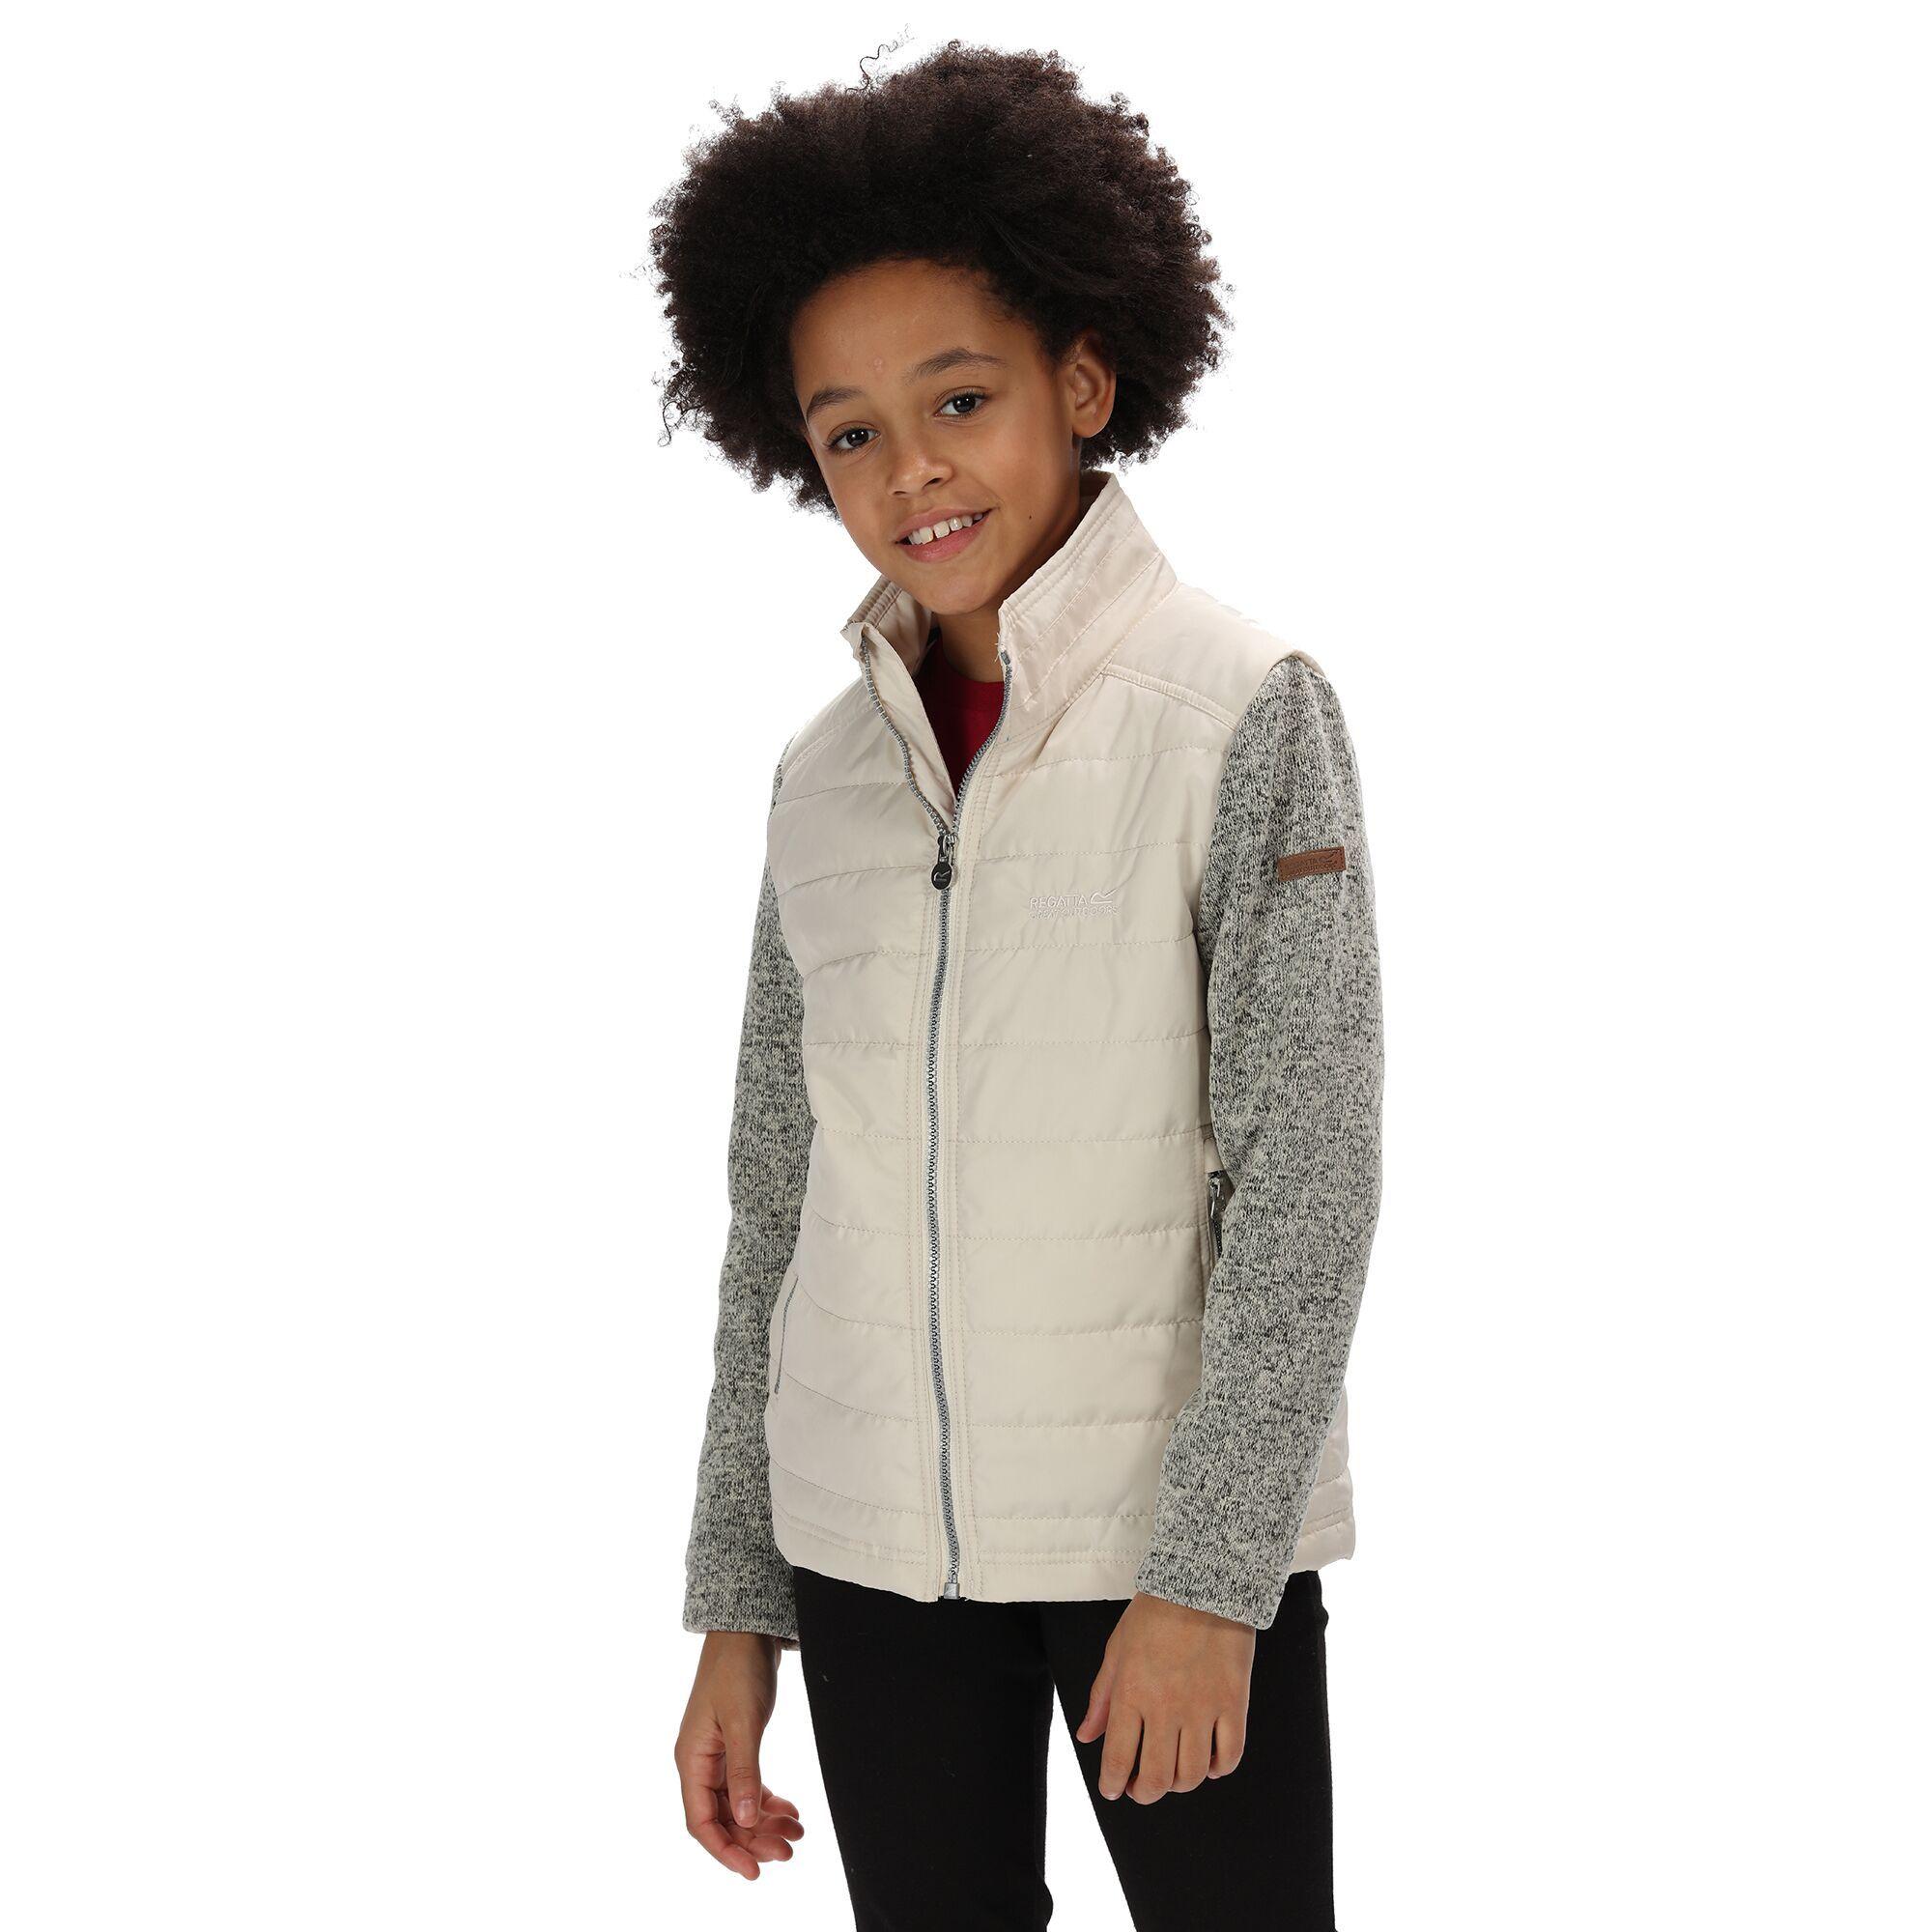 Regatta Childrens/Kids Kenya Padded Jacket With Fleece Sleeves